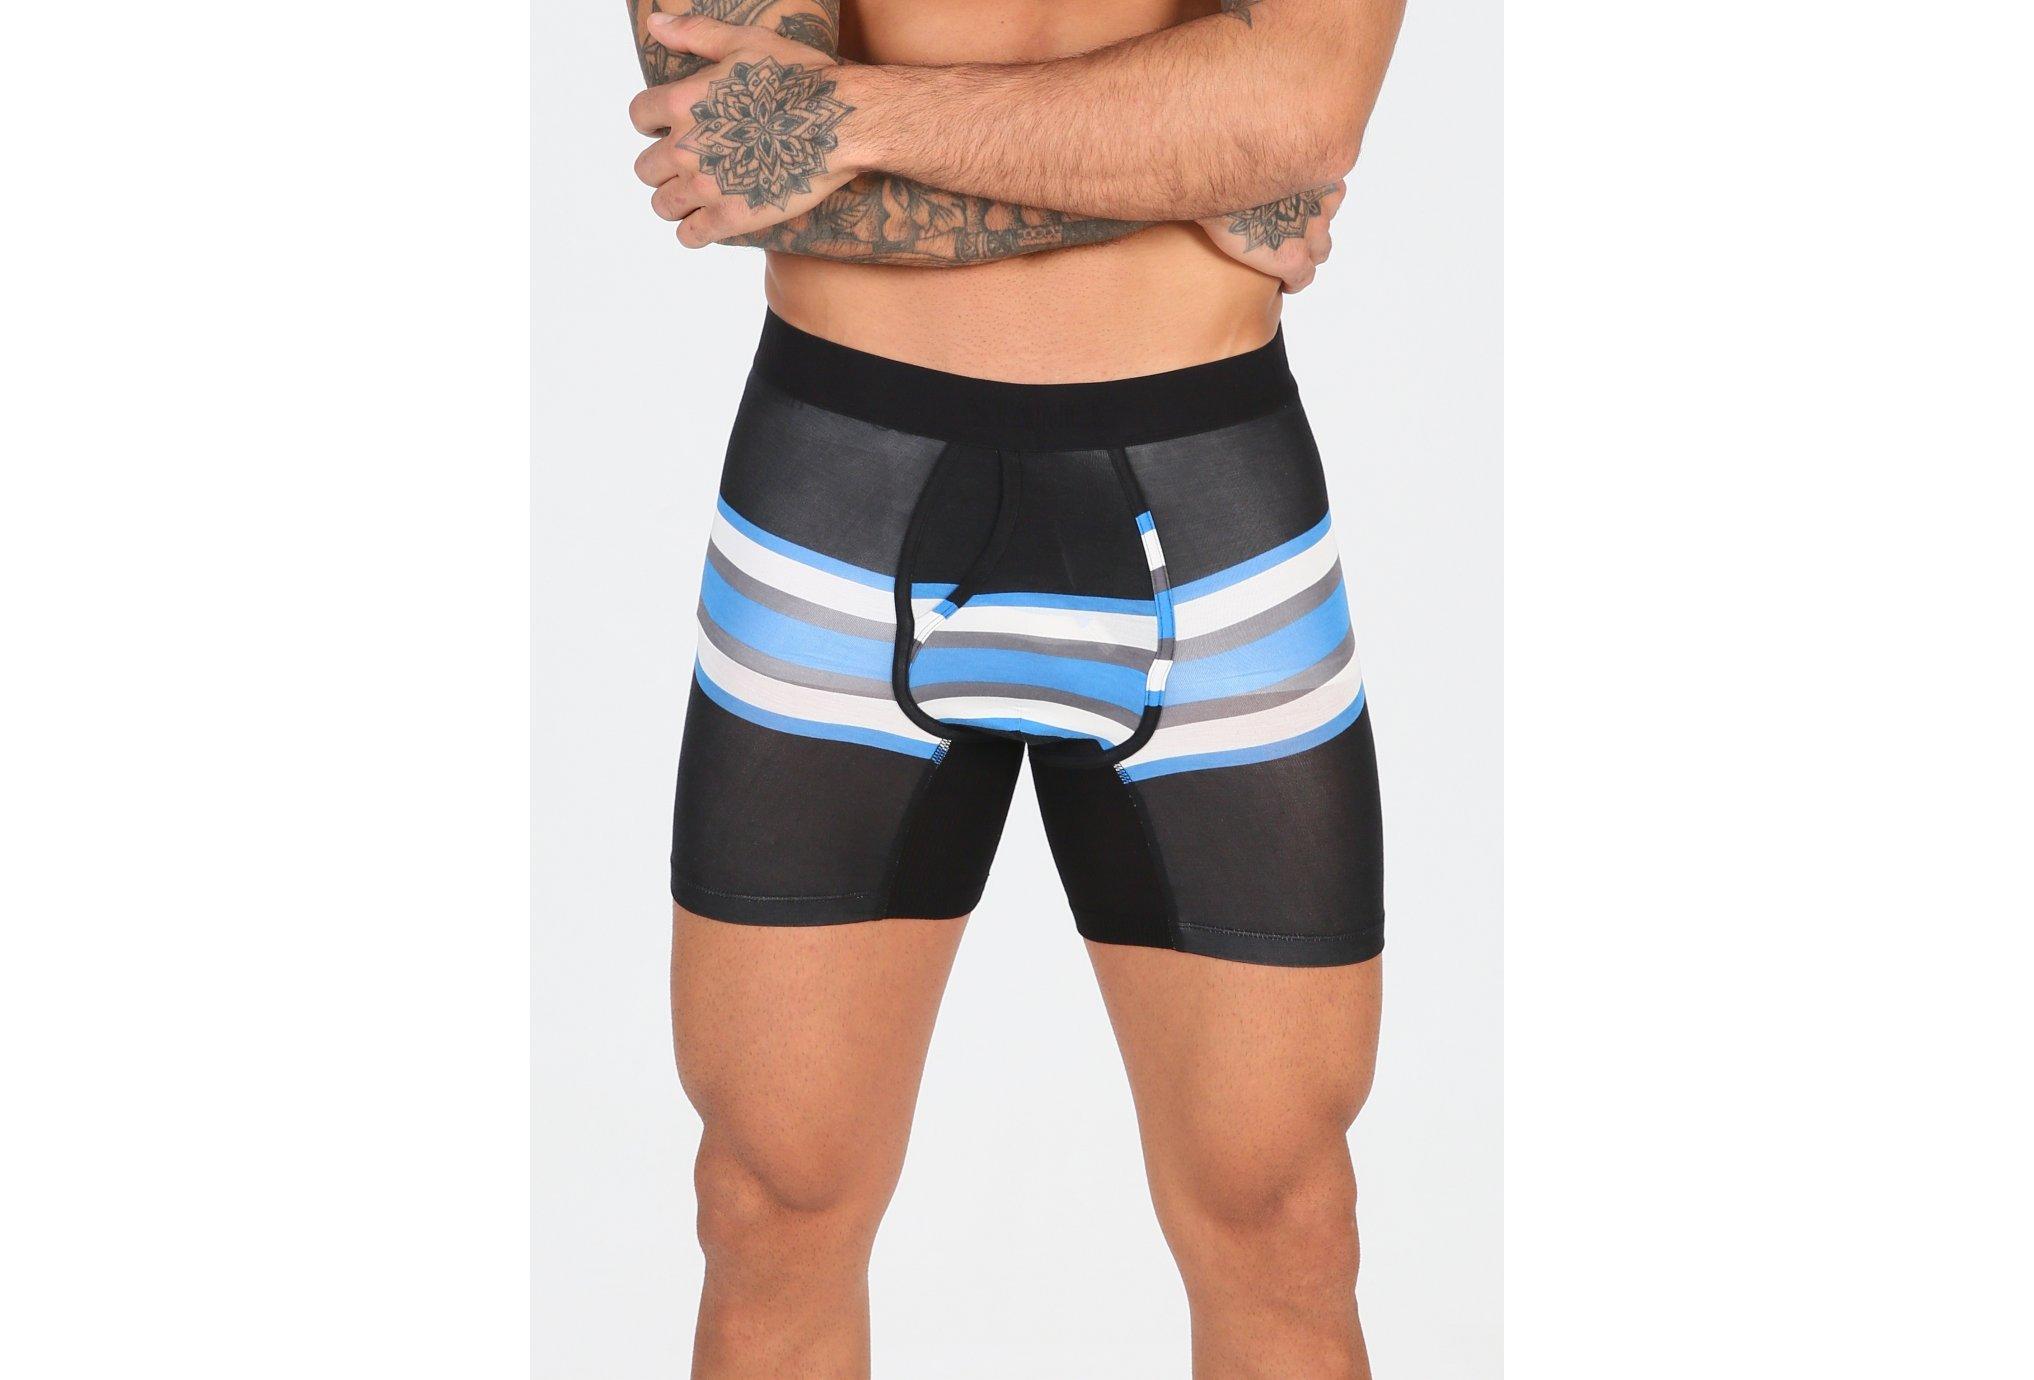 Stance WholesterJoan Boxer Brief vêtement running homme